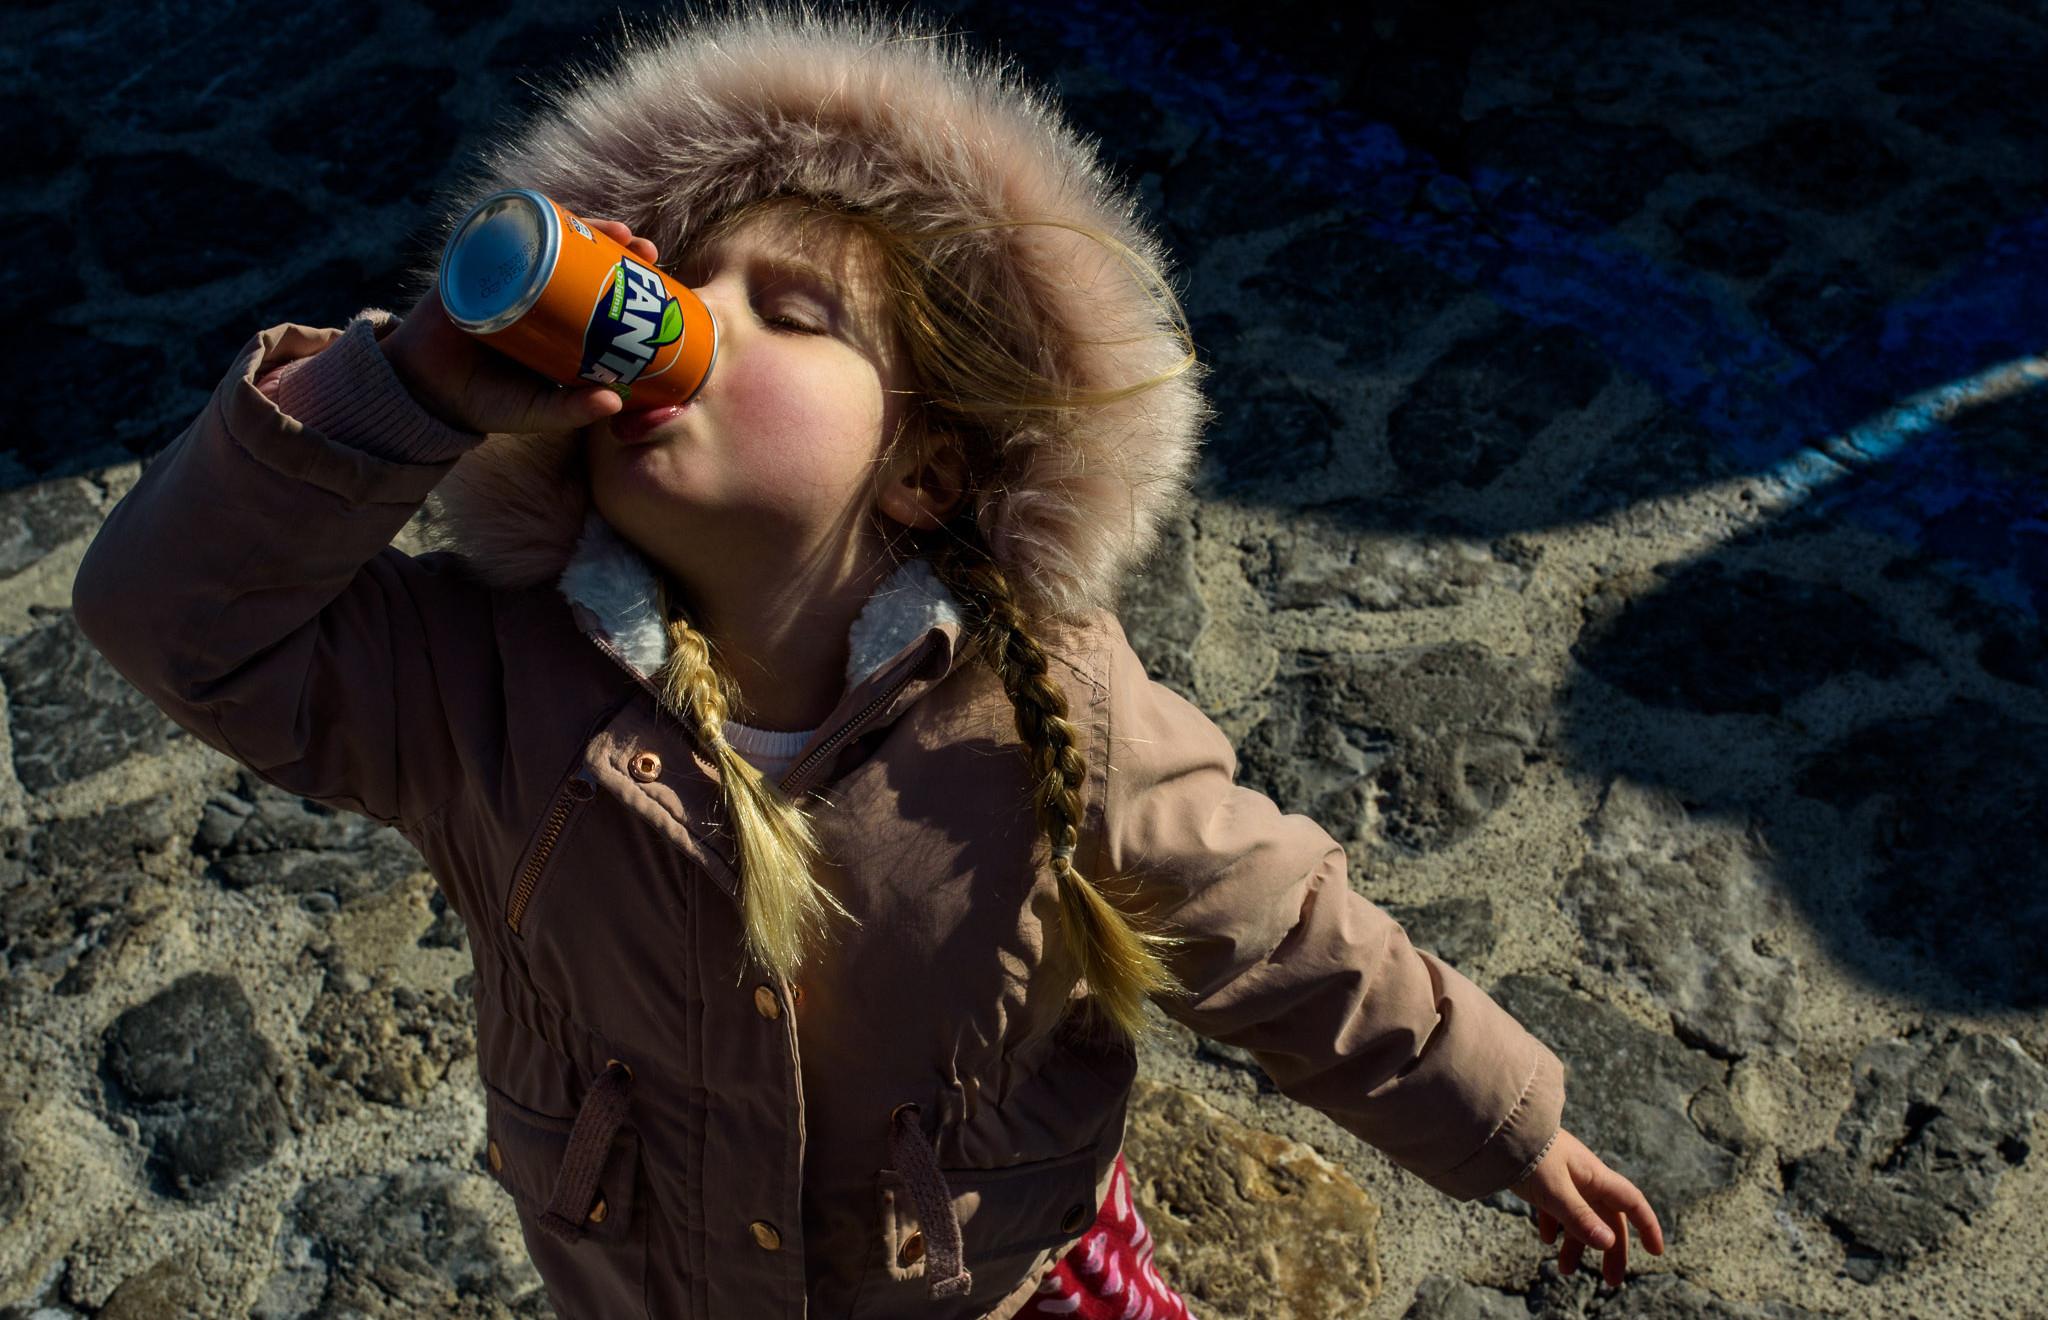 girl drinks Fanta in the sun